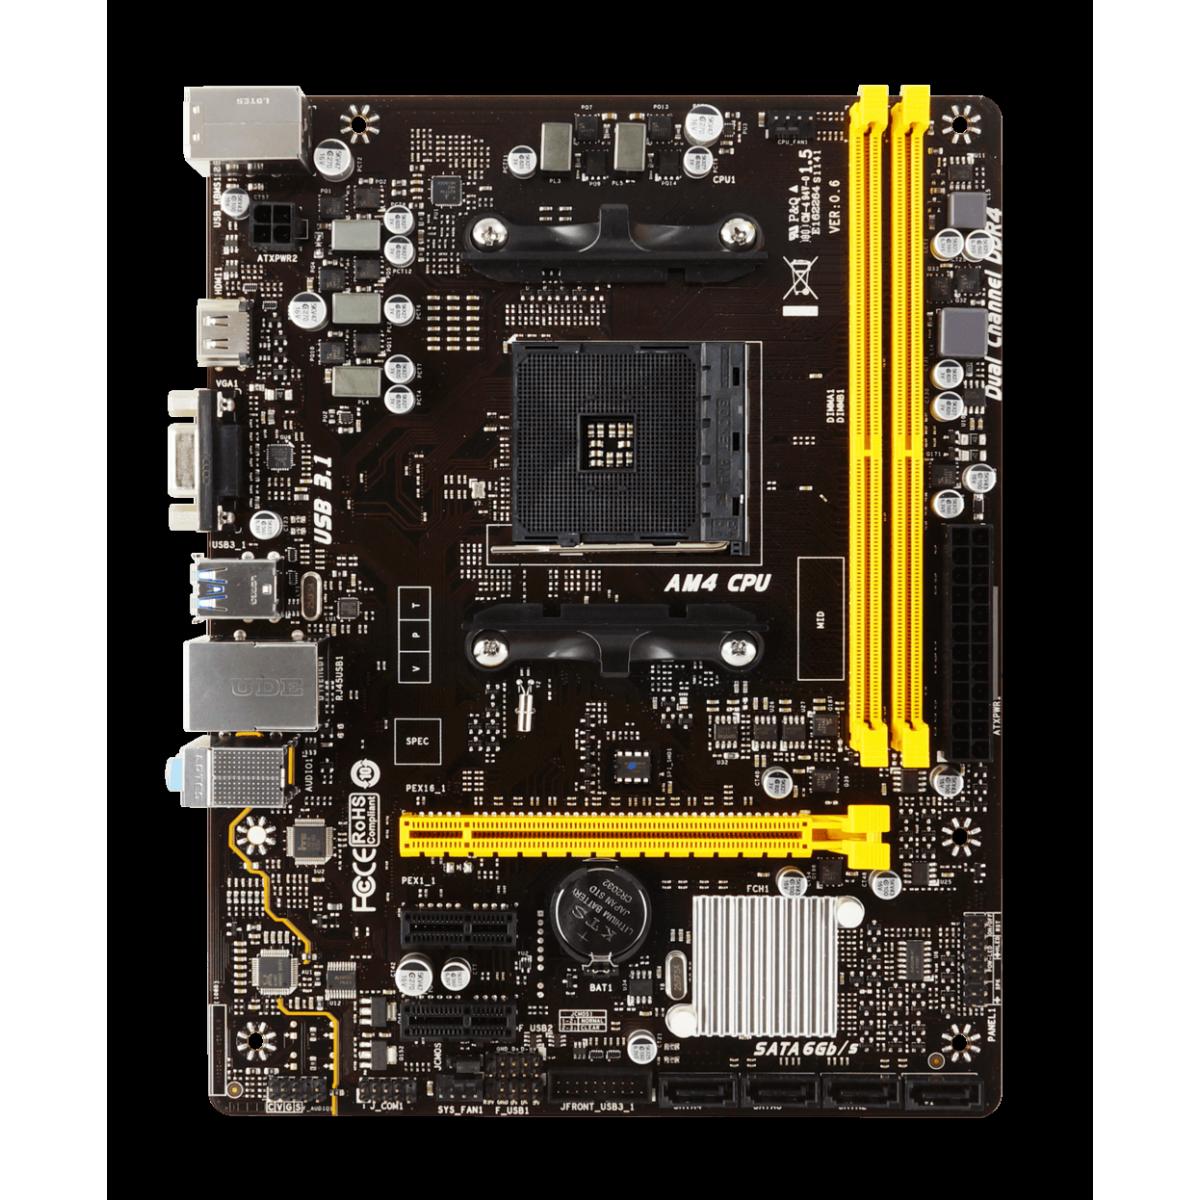 Kit Upgrade Biostar Geforce GT 610 + Ryzen 3 3300x + Biostar A320MH + Memória DDR4 16GB (2x8GB) 3000MHz + Cooler de Brinde